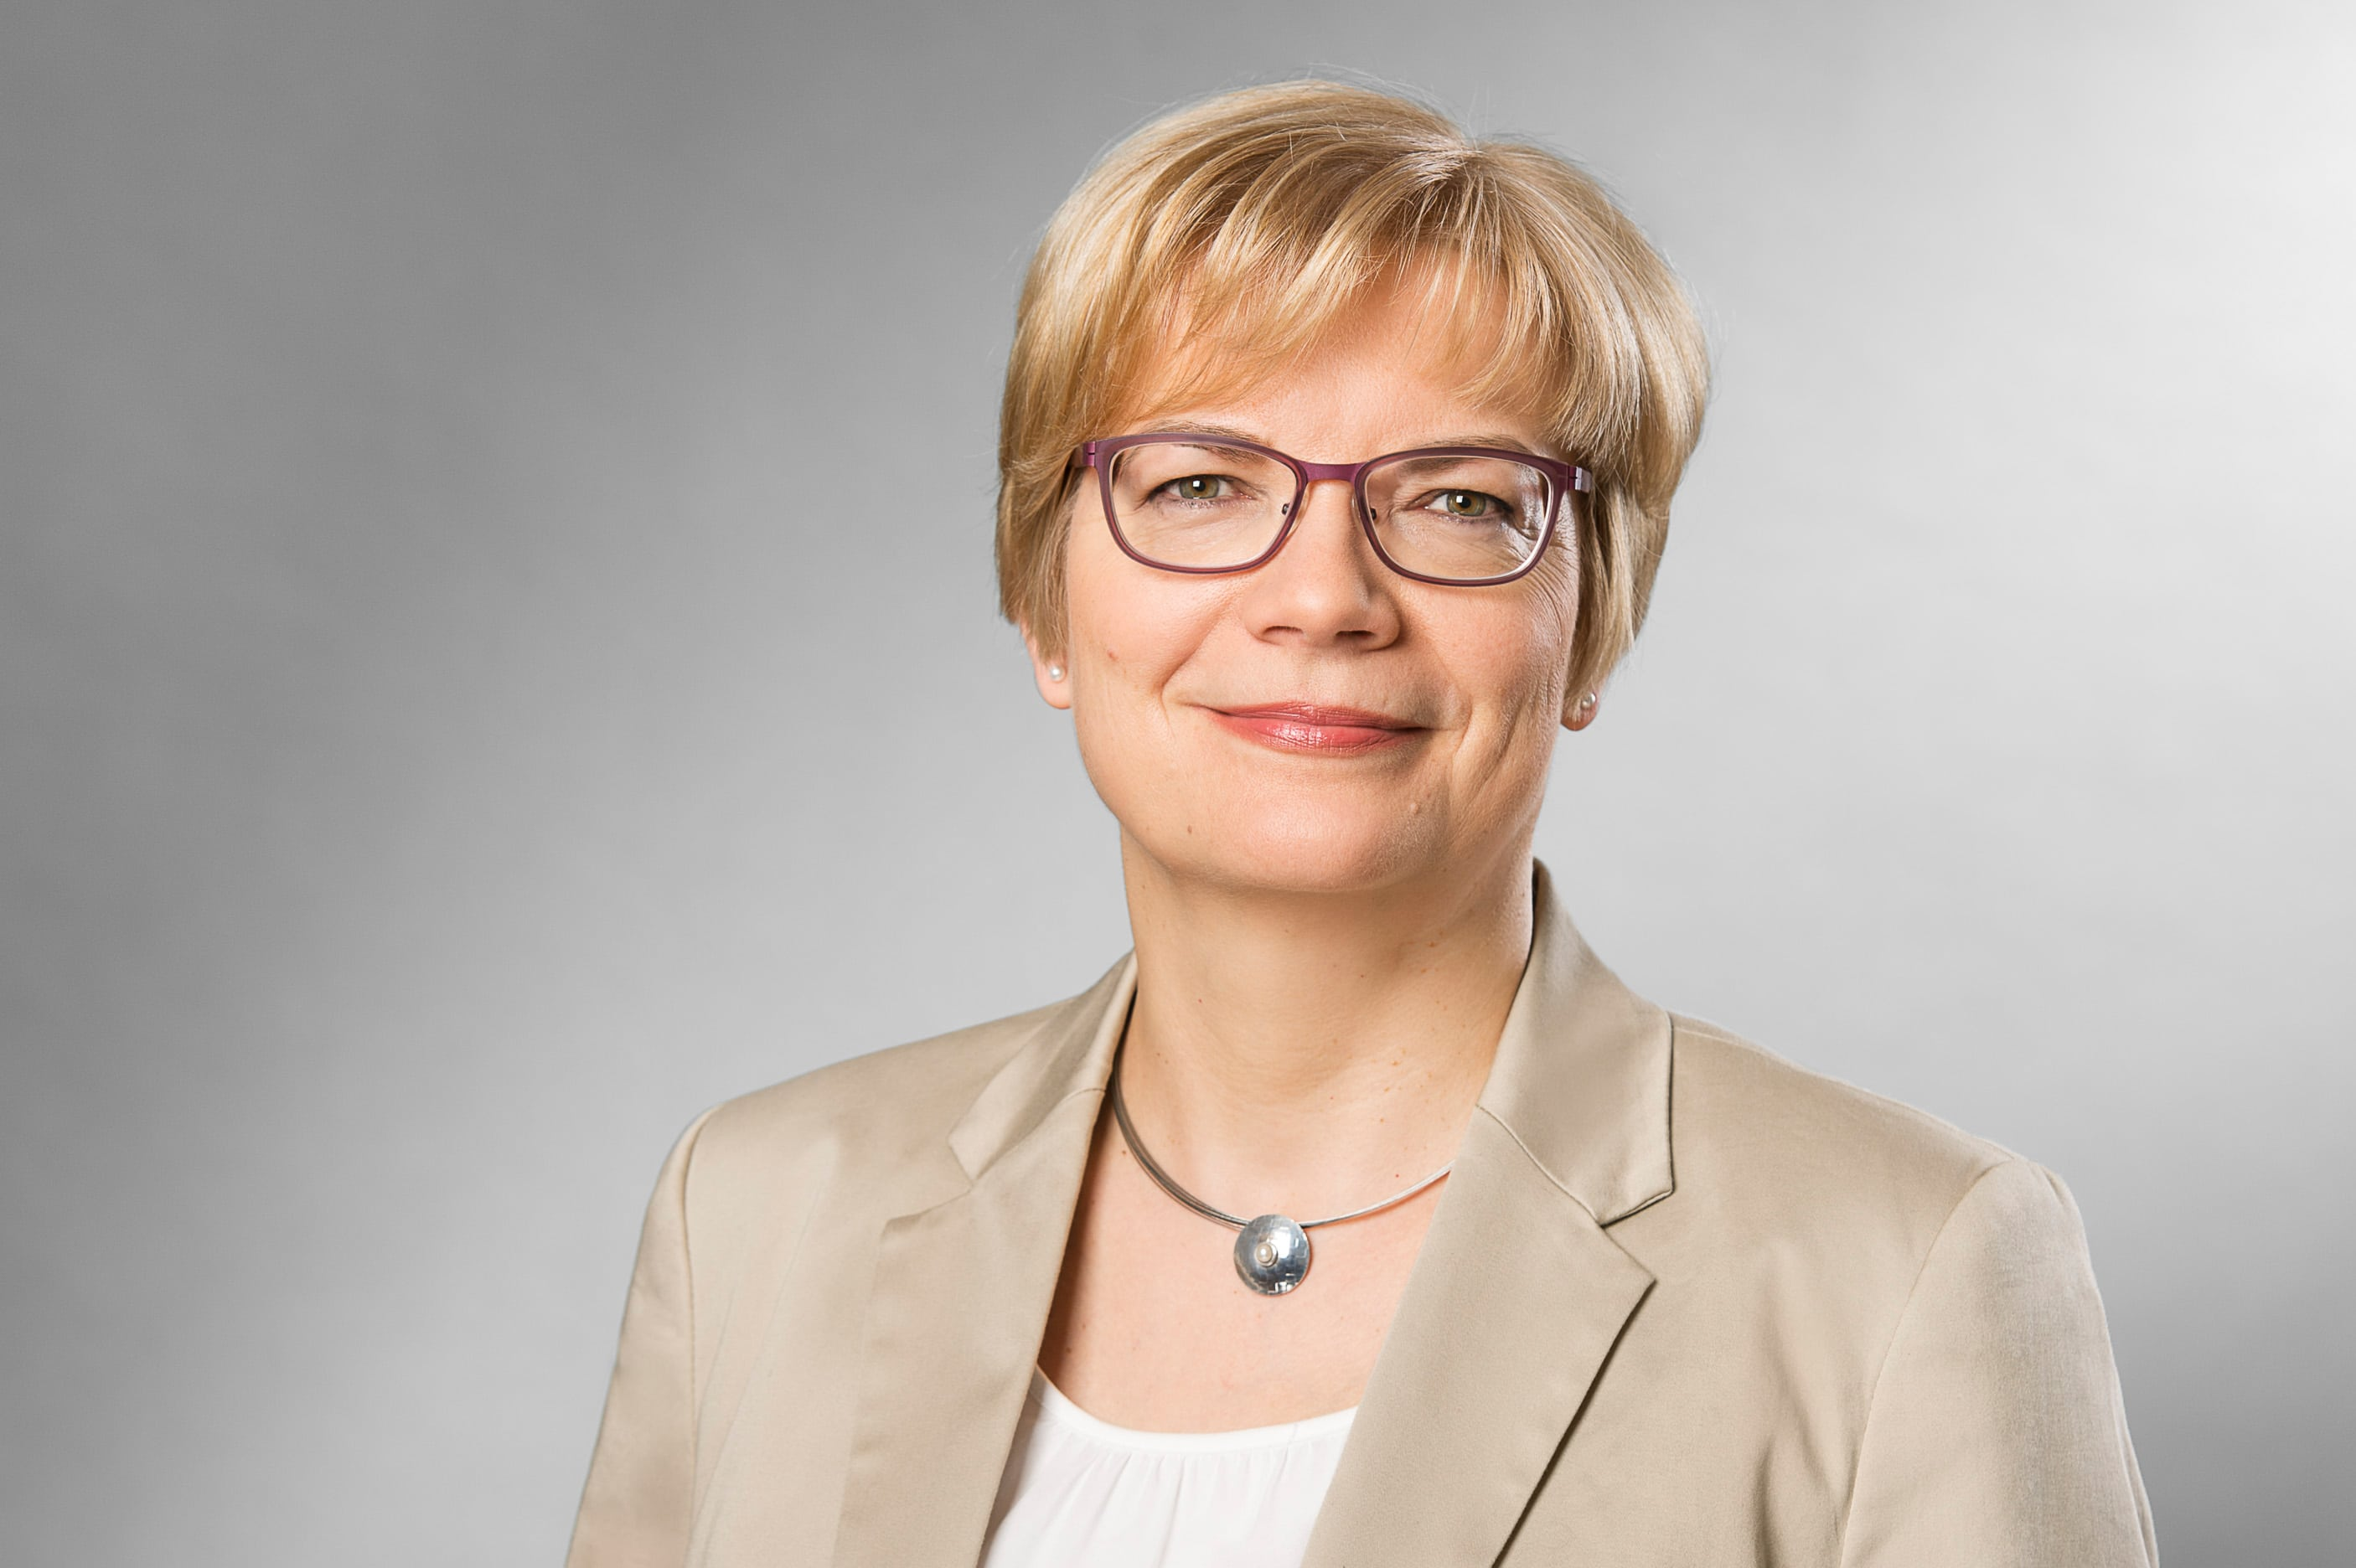 Daniela Emgelhard